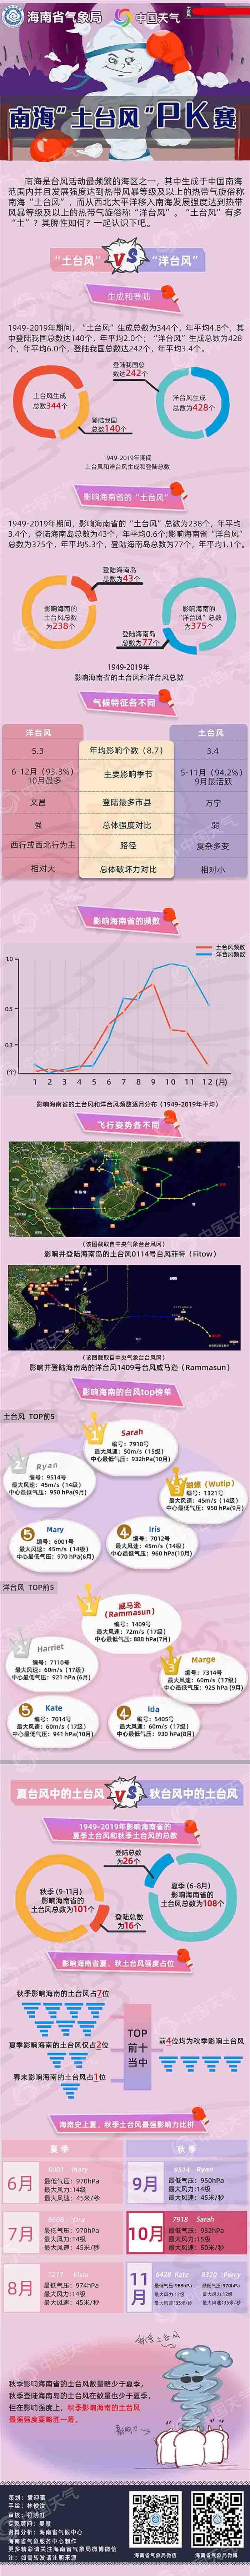 http://i.weather.com.cn/images/hainan/newzt/zt2019new/2021/04/29/1619663771735068812.jpg